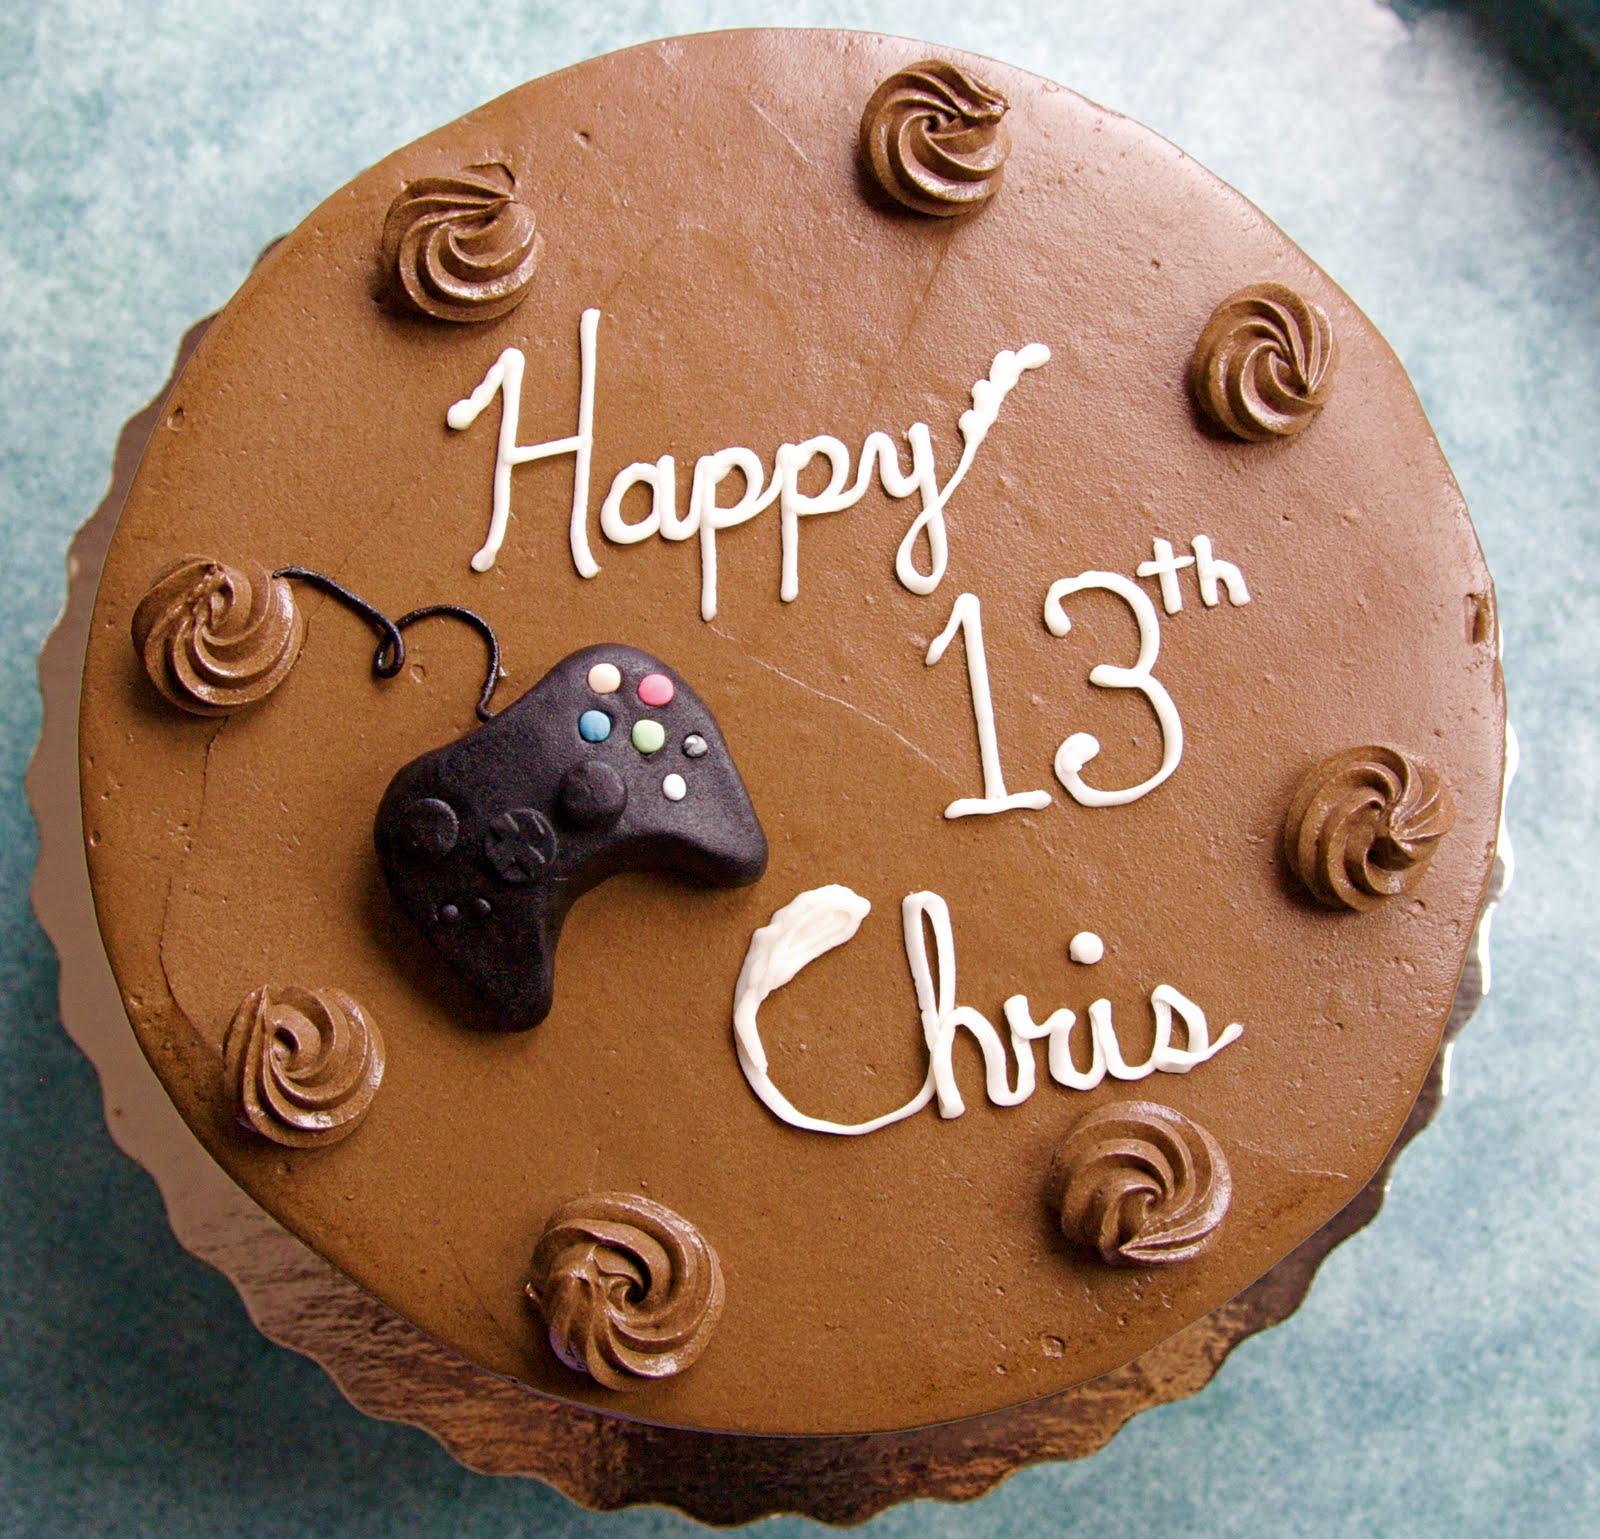 Birthday Chocolate Cake Games Image Inspiration of Cake and